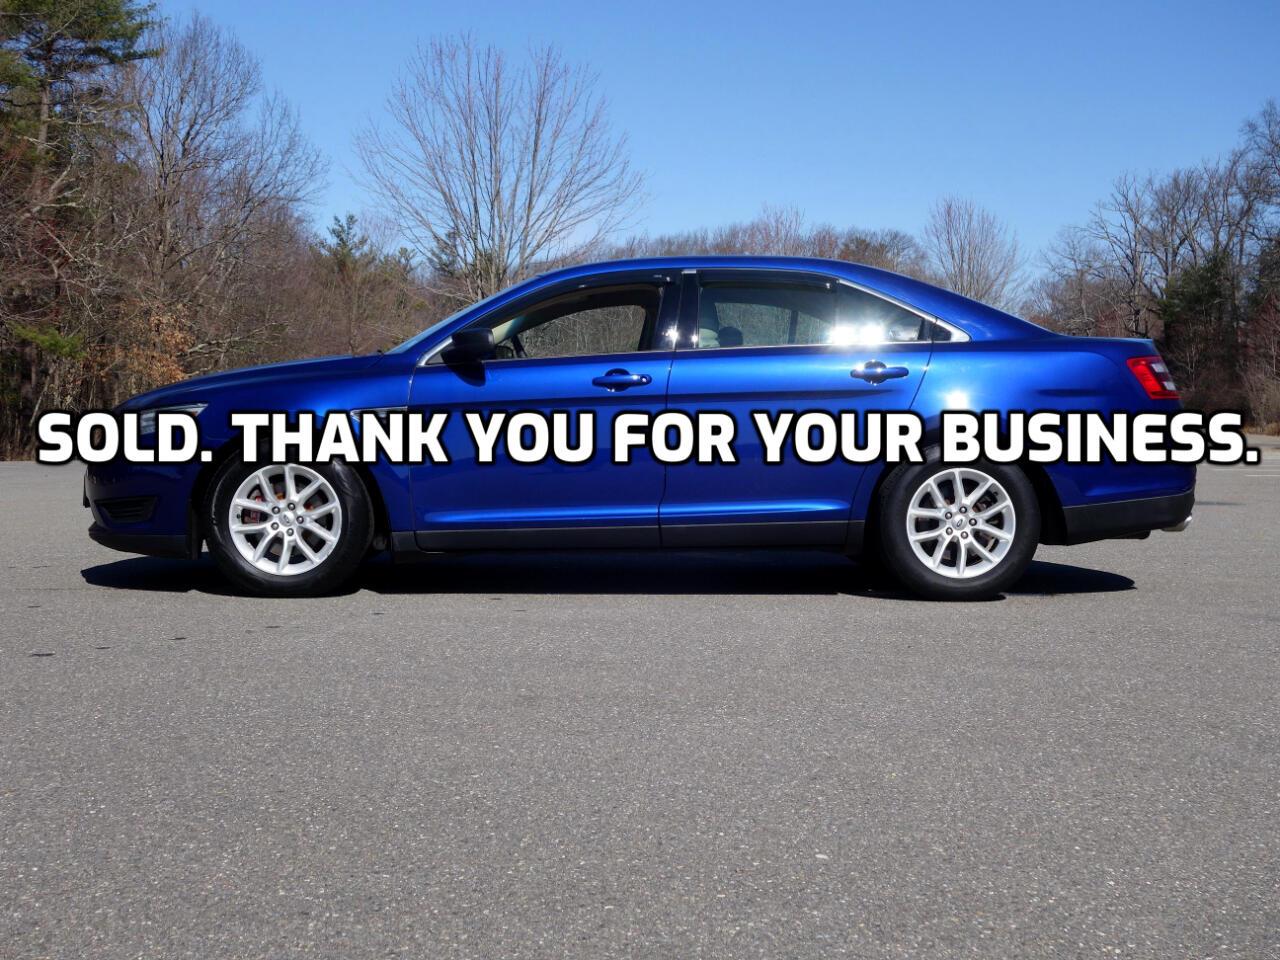 Ford Taurus 4dr Sdn SE FWD 2013